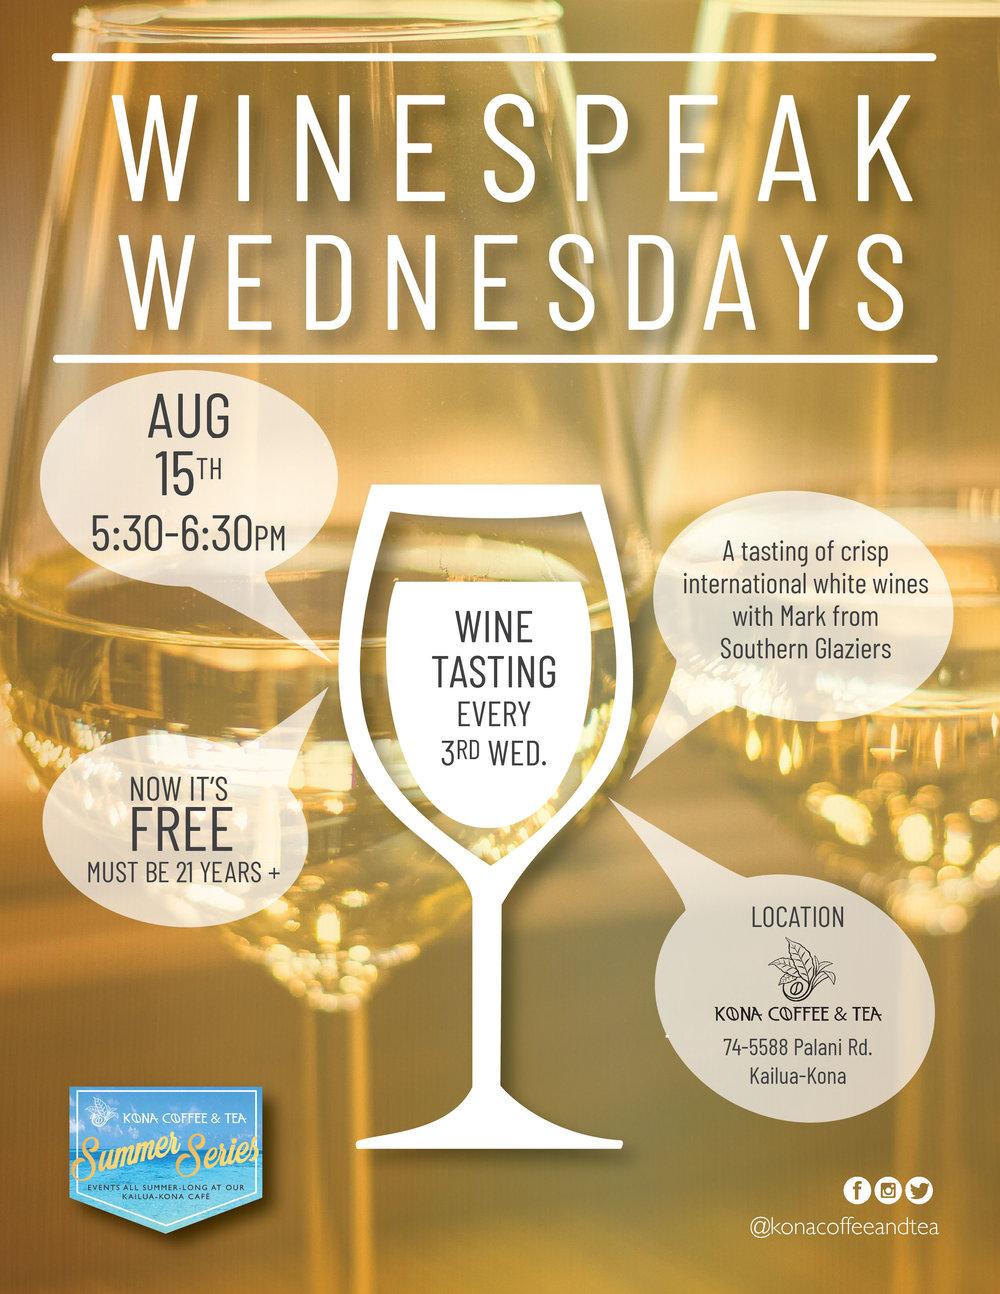 WineSpeak Wednesdays_8.15.18_KCTC 8.5x11 poster-01.jpg